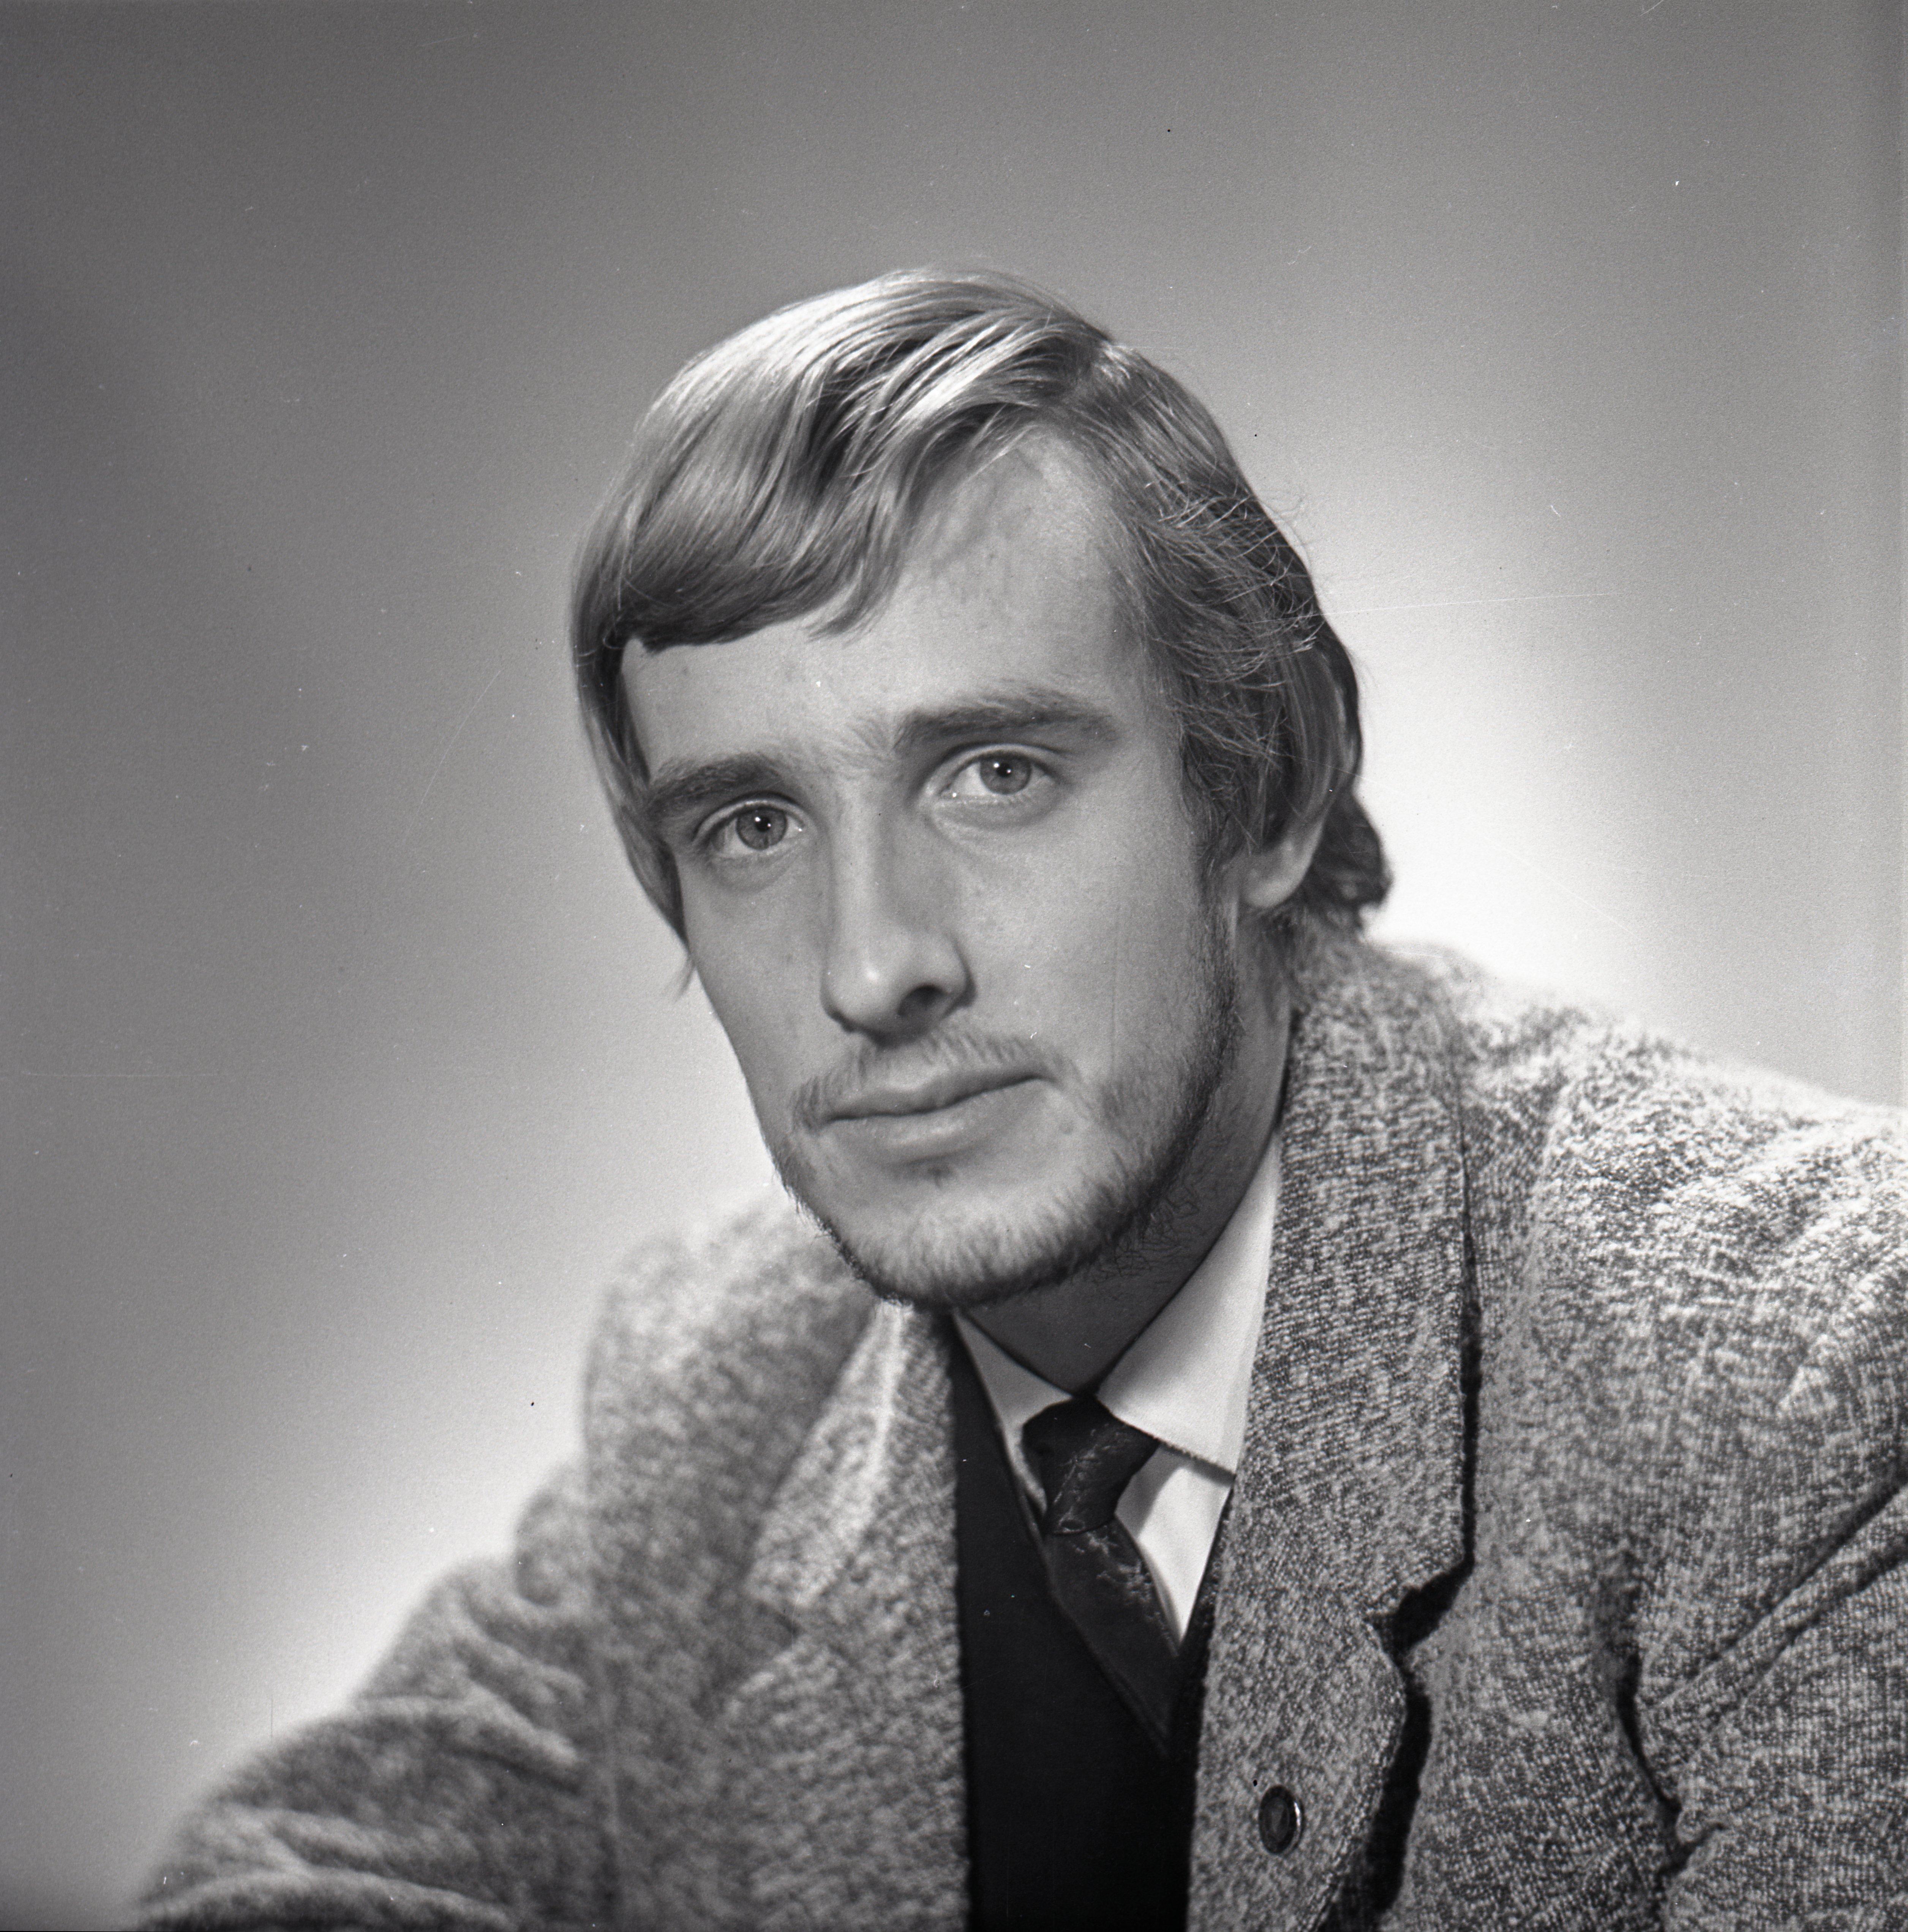 EFA 0-233426. Lembit Ulfsak. Foto: Tallinnfilm, 1971-'75